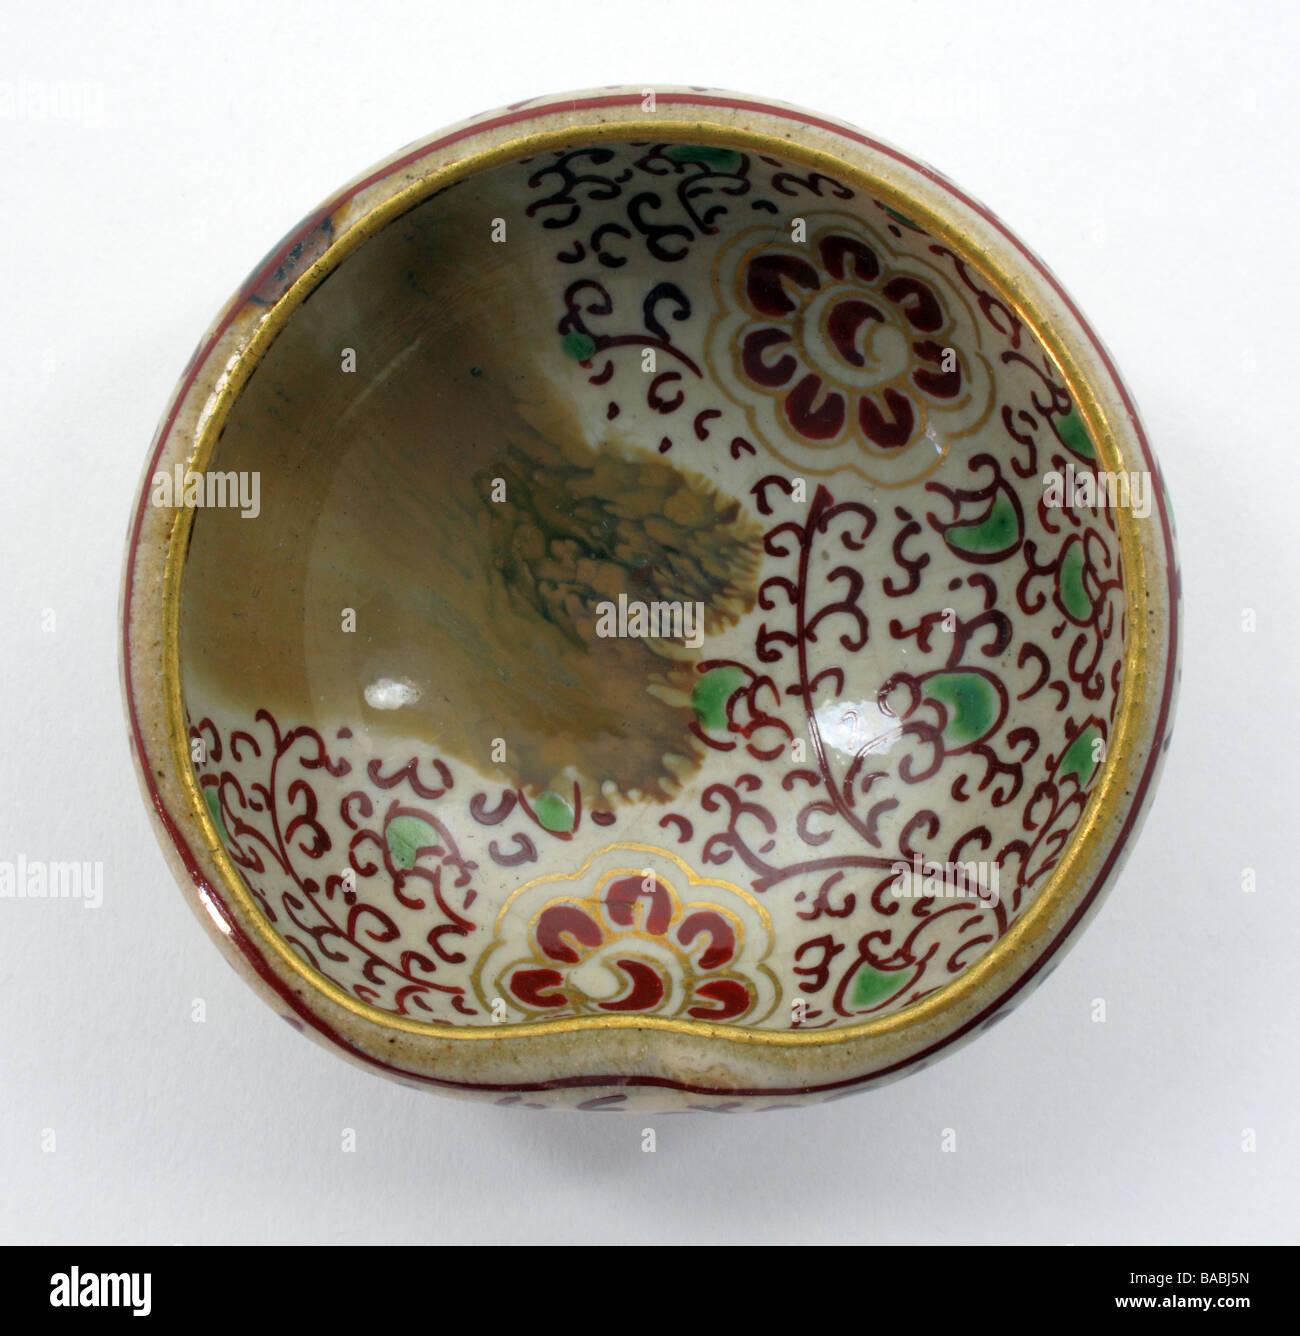 Antique Japanese porcelain pottery sake cup Stock Photo: 23612673